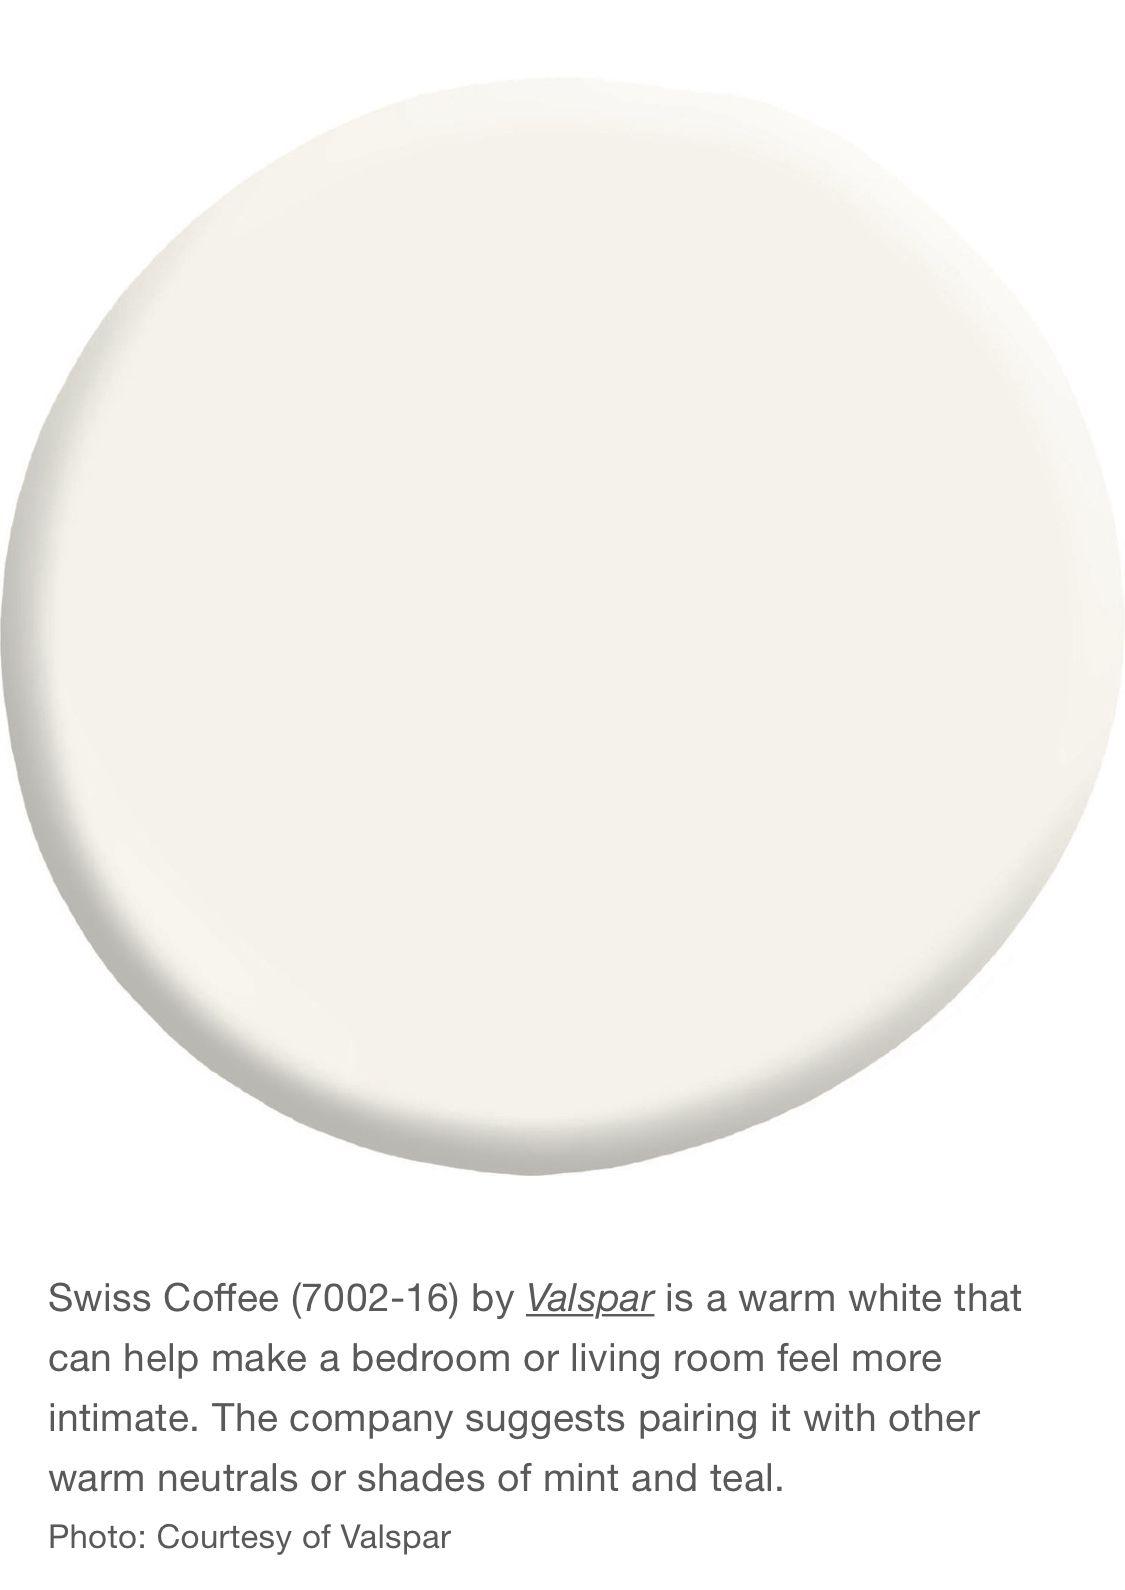 Valspar Swiss Coffee Off White Paint Colors Swiss Coffee Paint Valspar Paint Colors